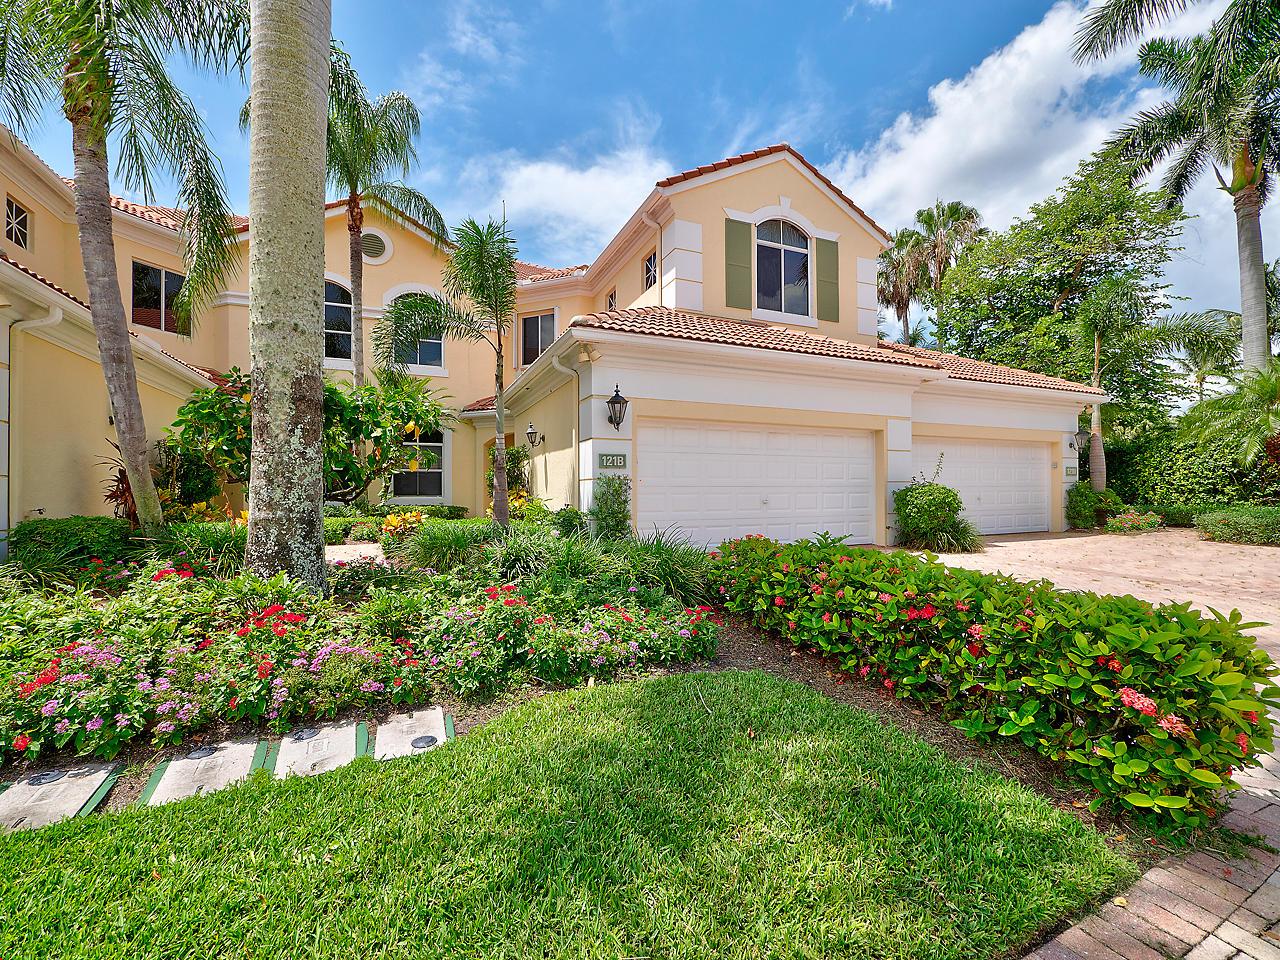 121 Palm Bay Terrace B,Palm Beach Gardens,Florida 33418,3 Bedrooms Bedrooms,2 BathroomsBathrooms,A,Palm Bay,RX-10448417